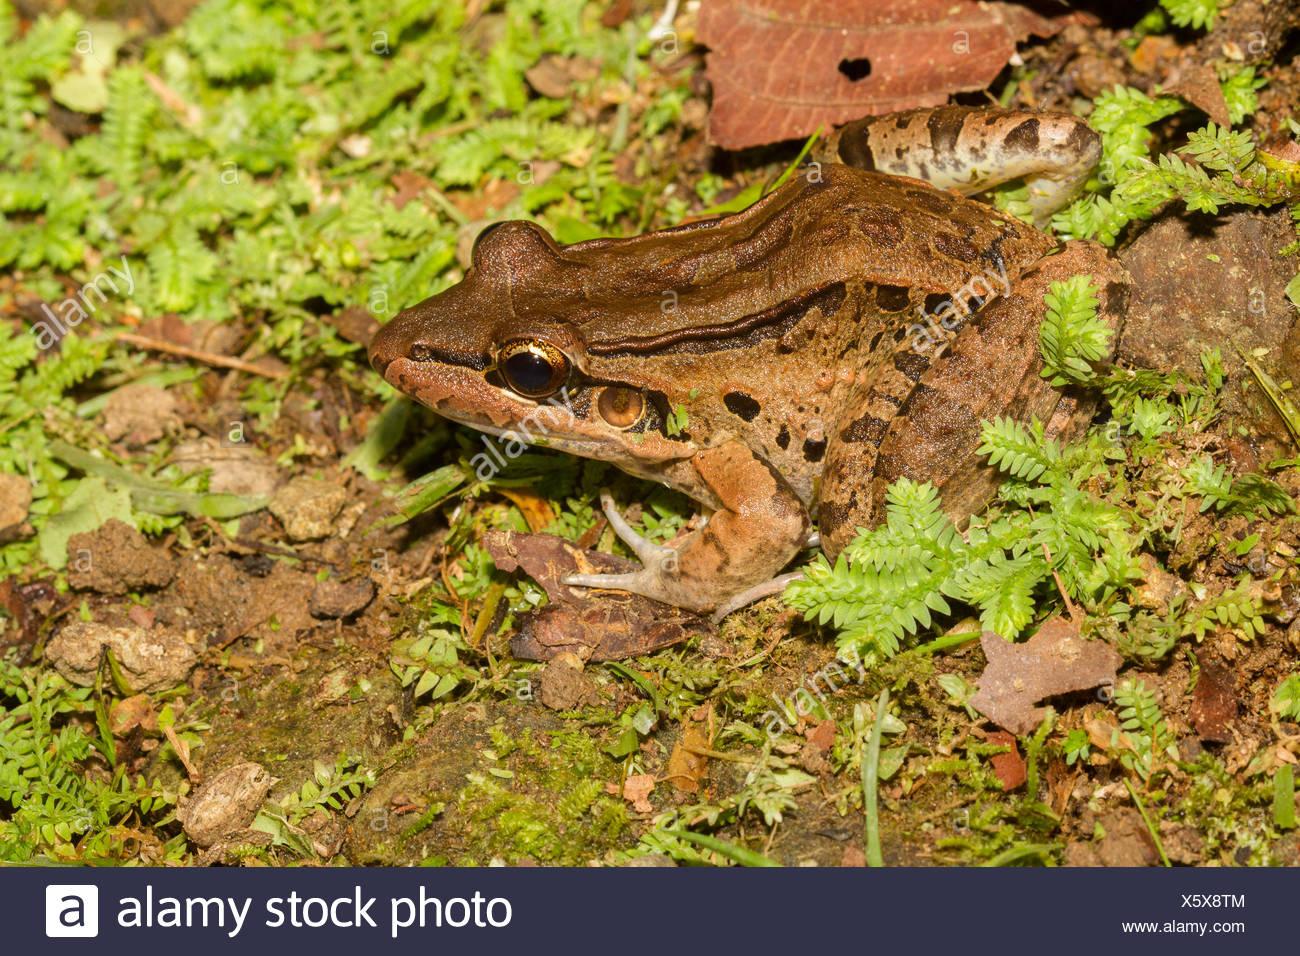 Bolivian frog, Central America, Costa Rica - Stock Image